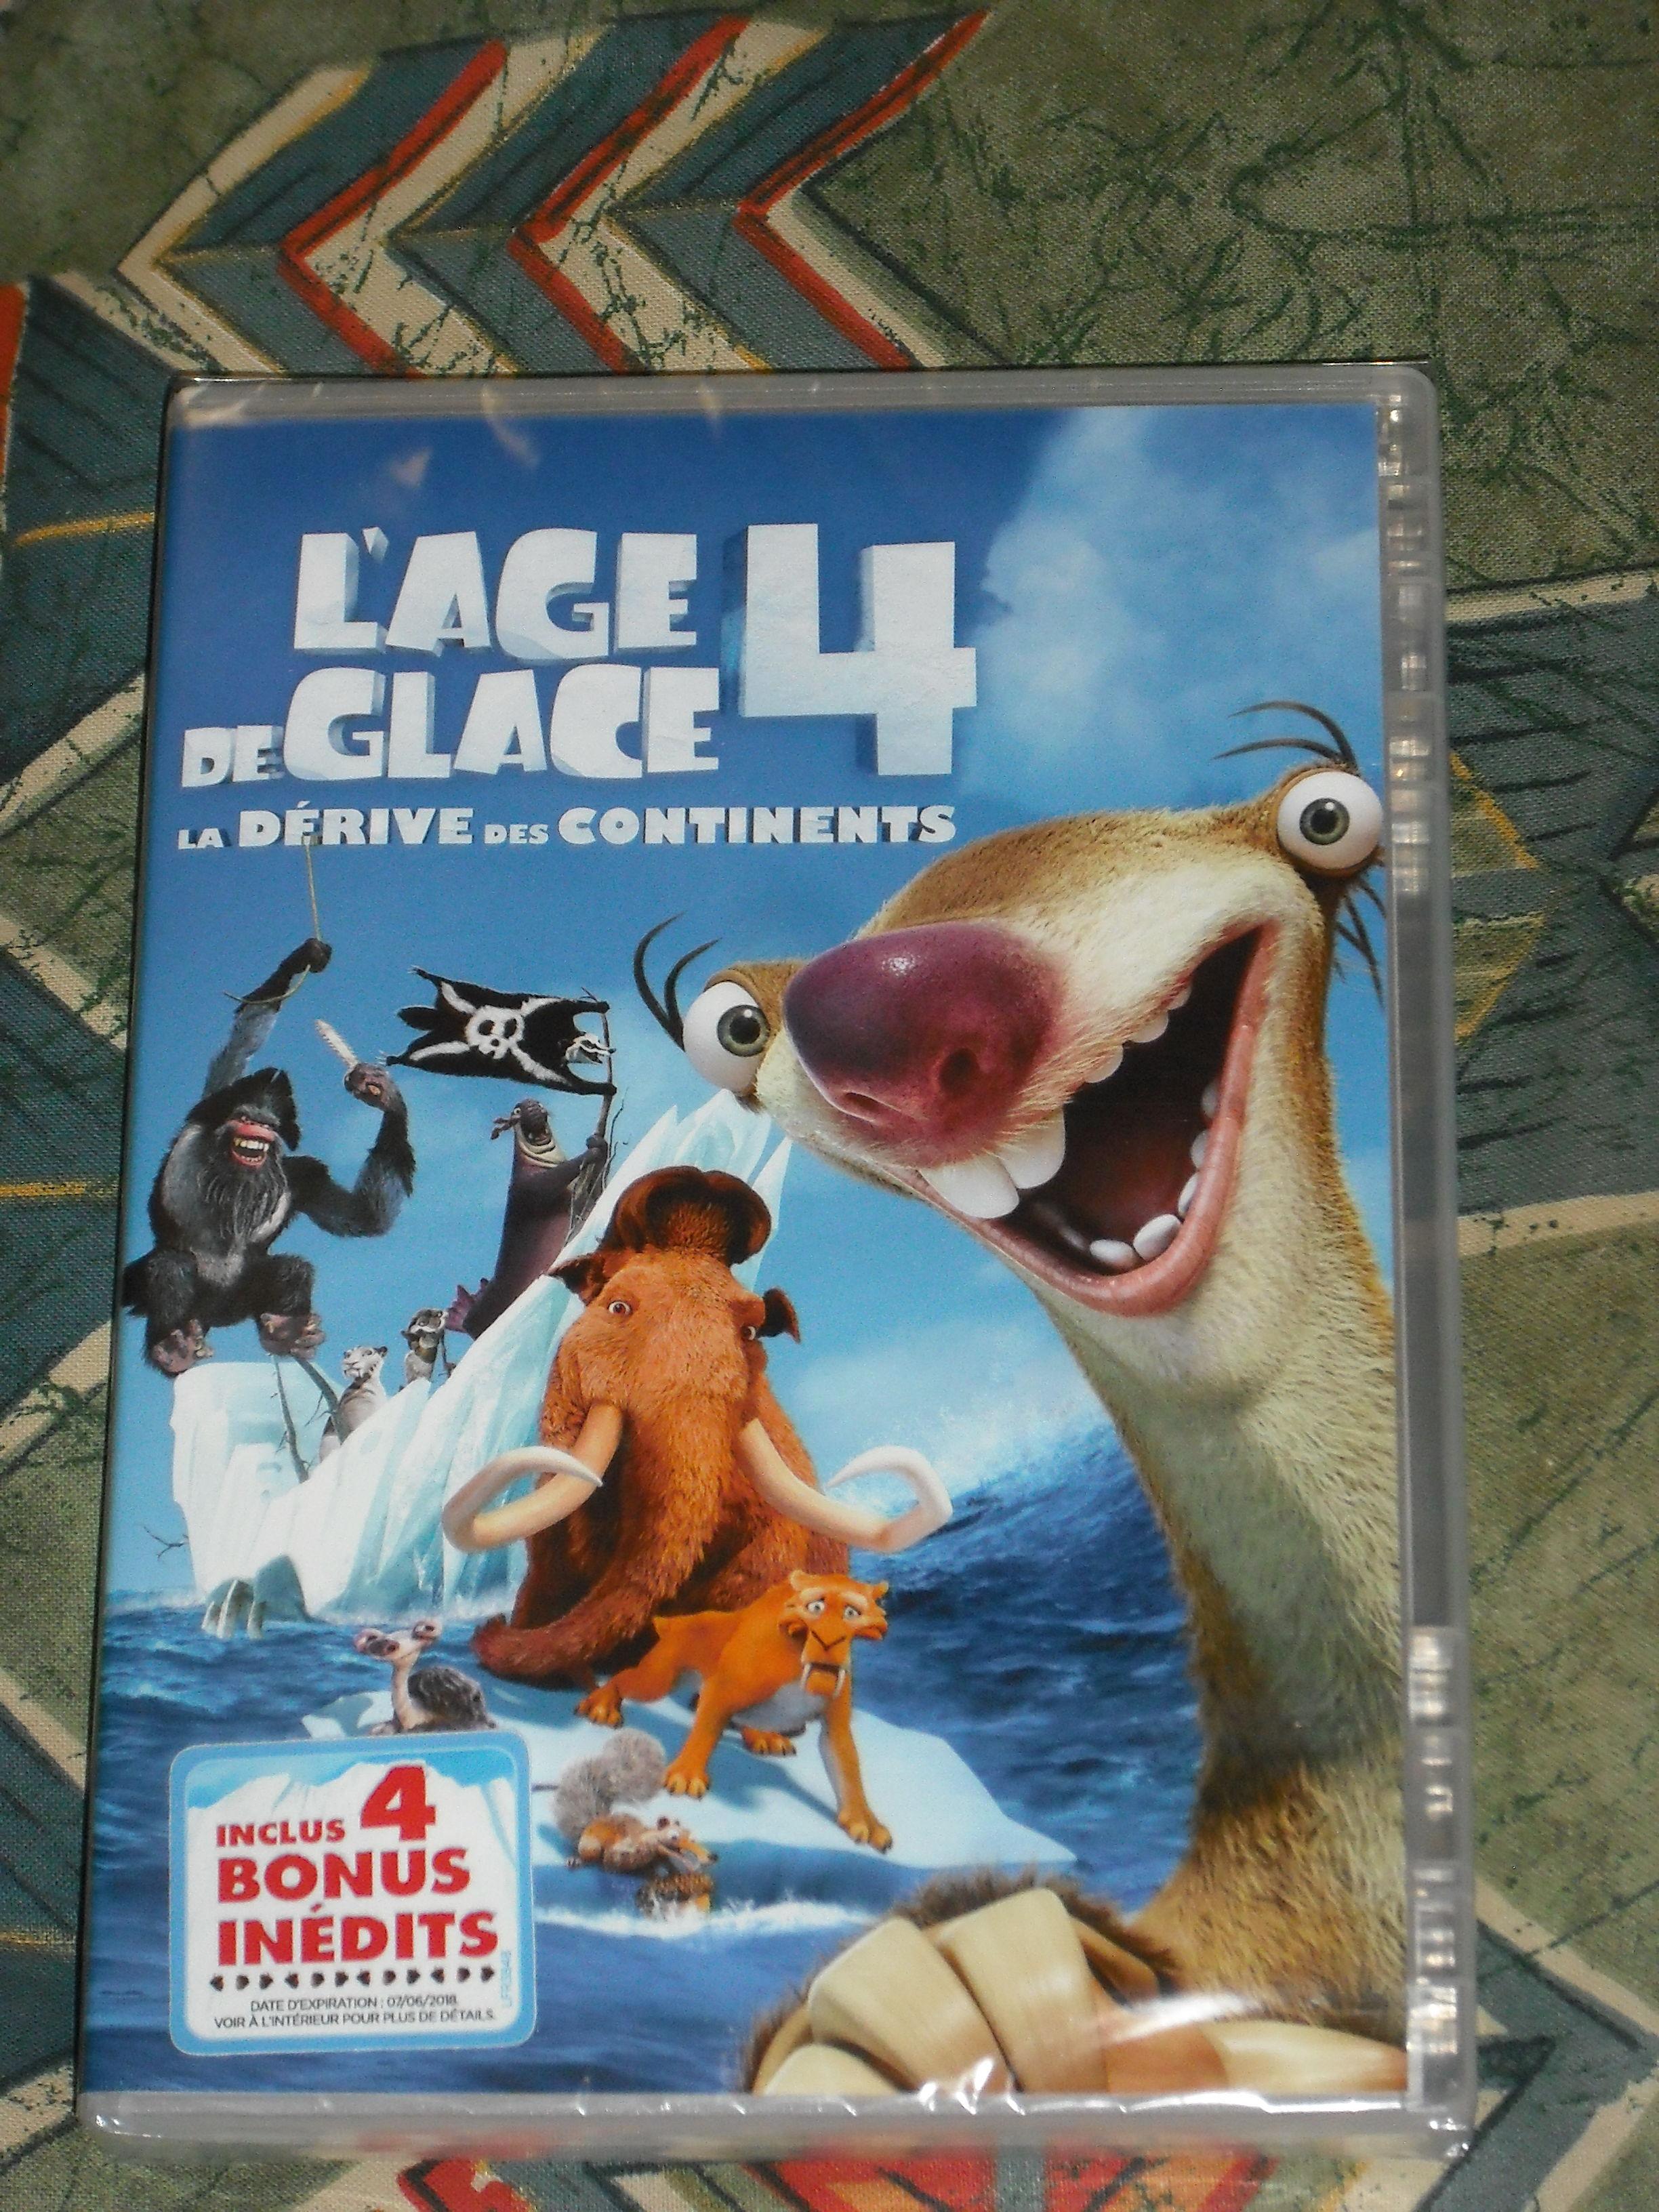 DVD l'Age de glace 4 neuf    6 euros 6 Cramont (80)